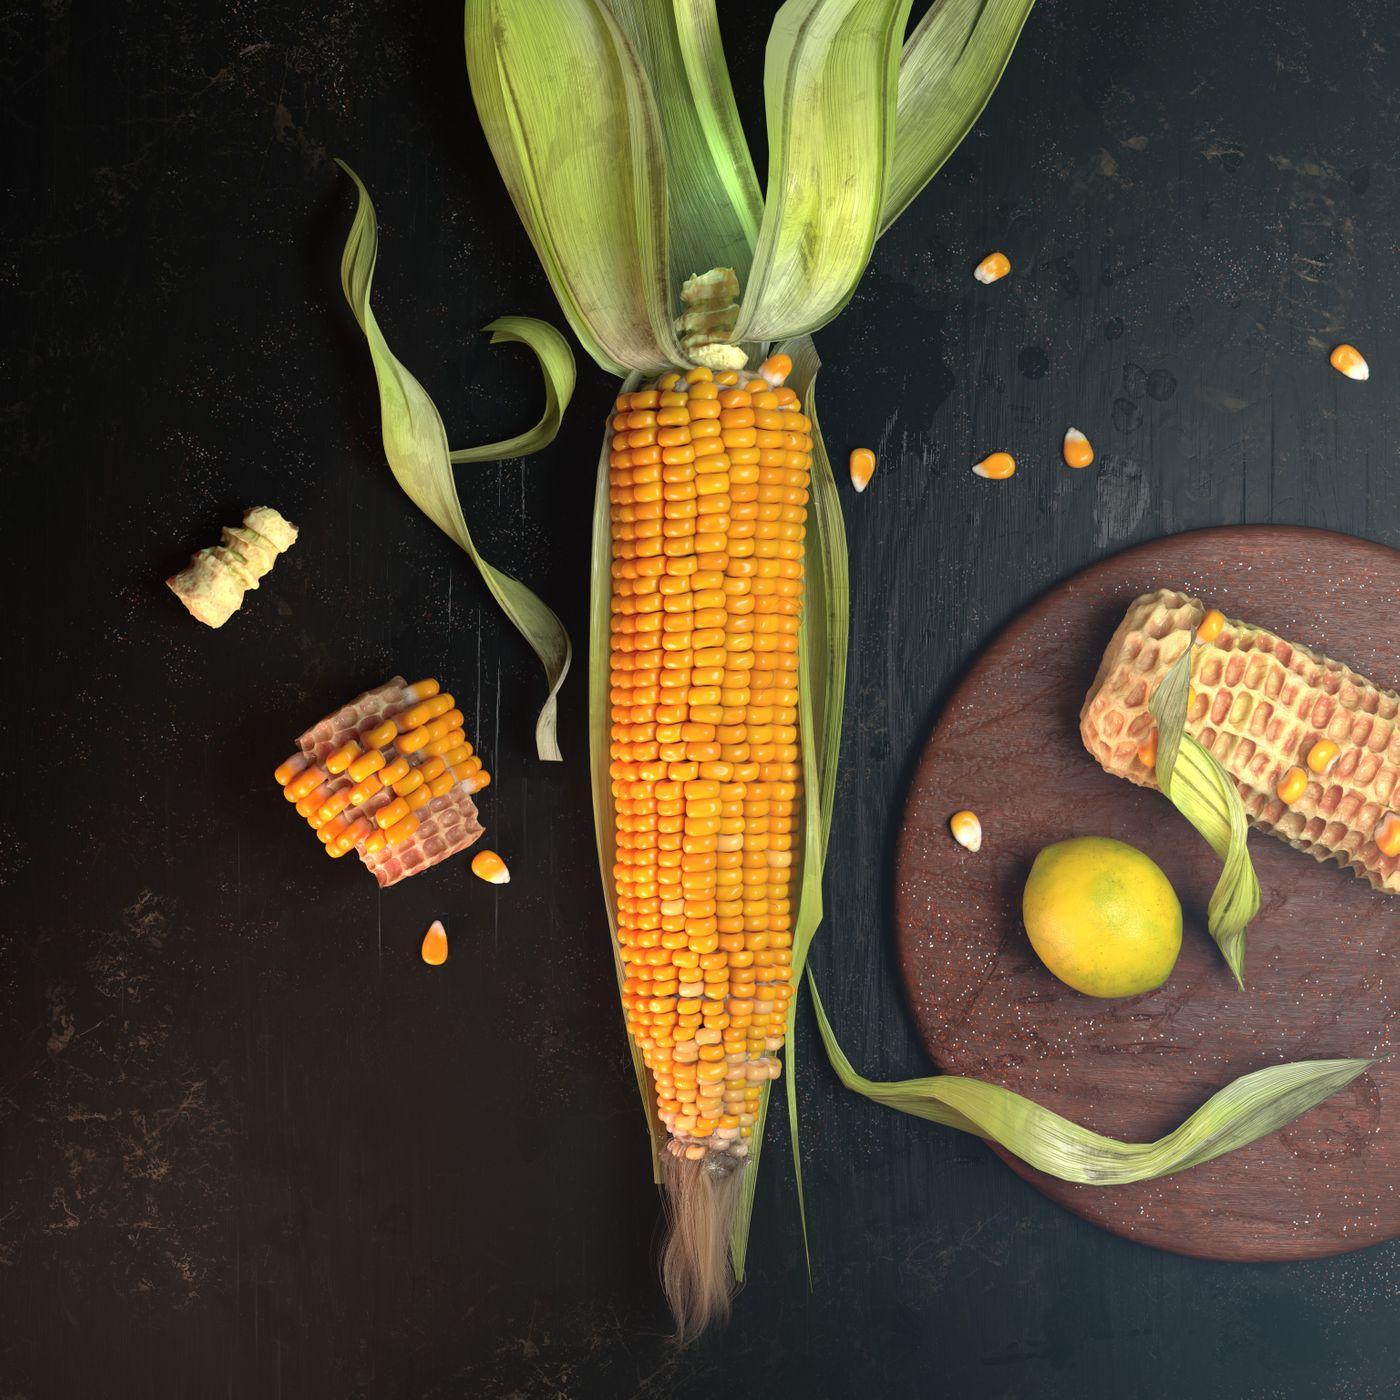 Corn Image 1 Vedaprashanth61